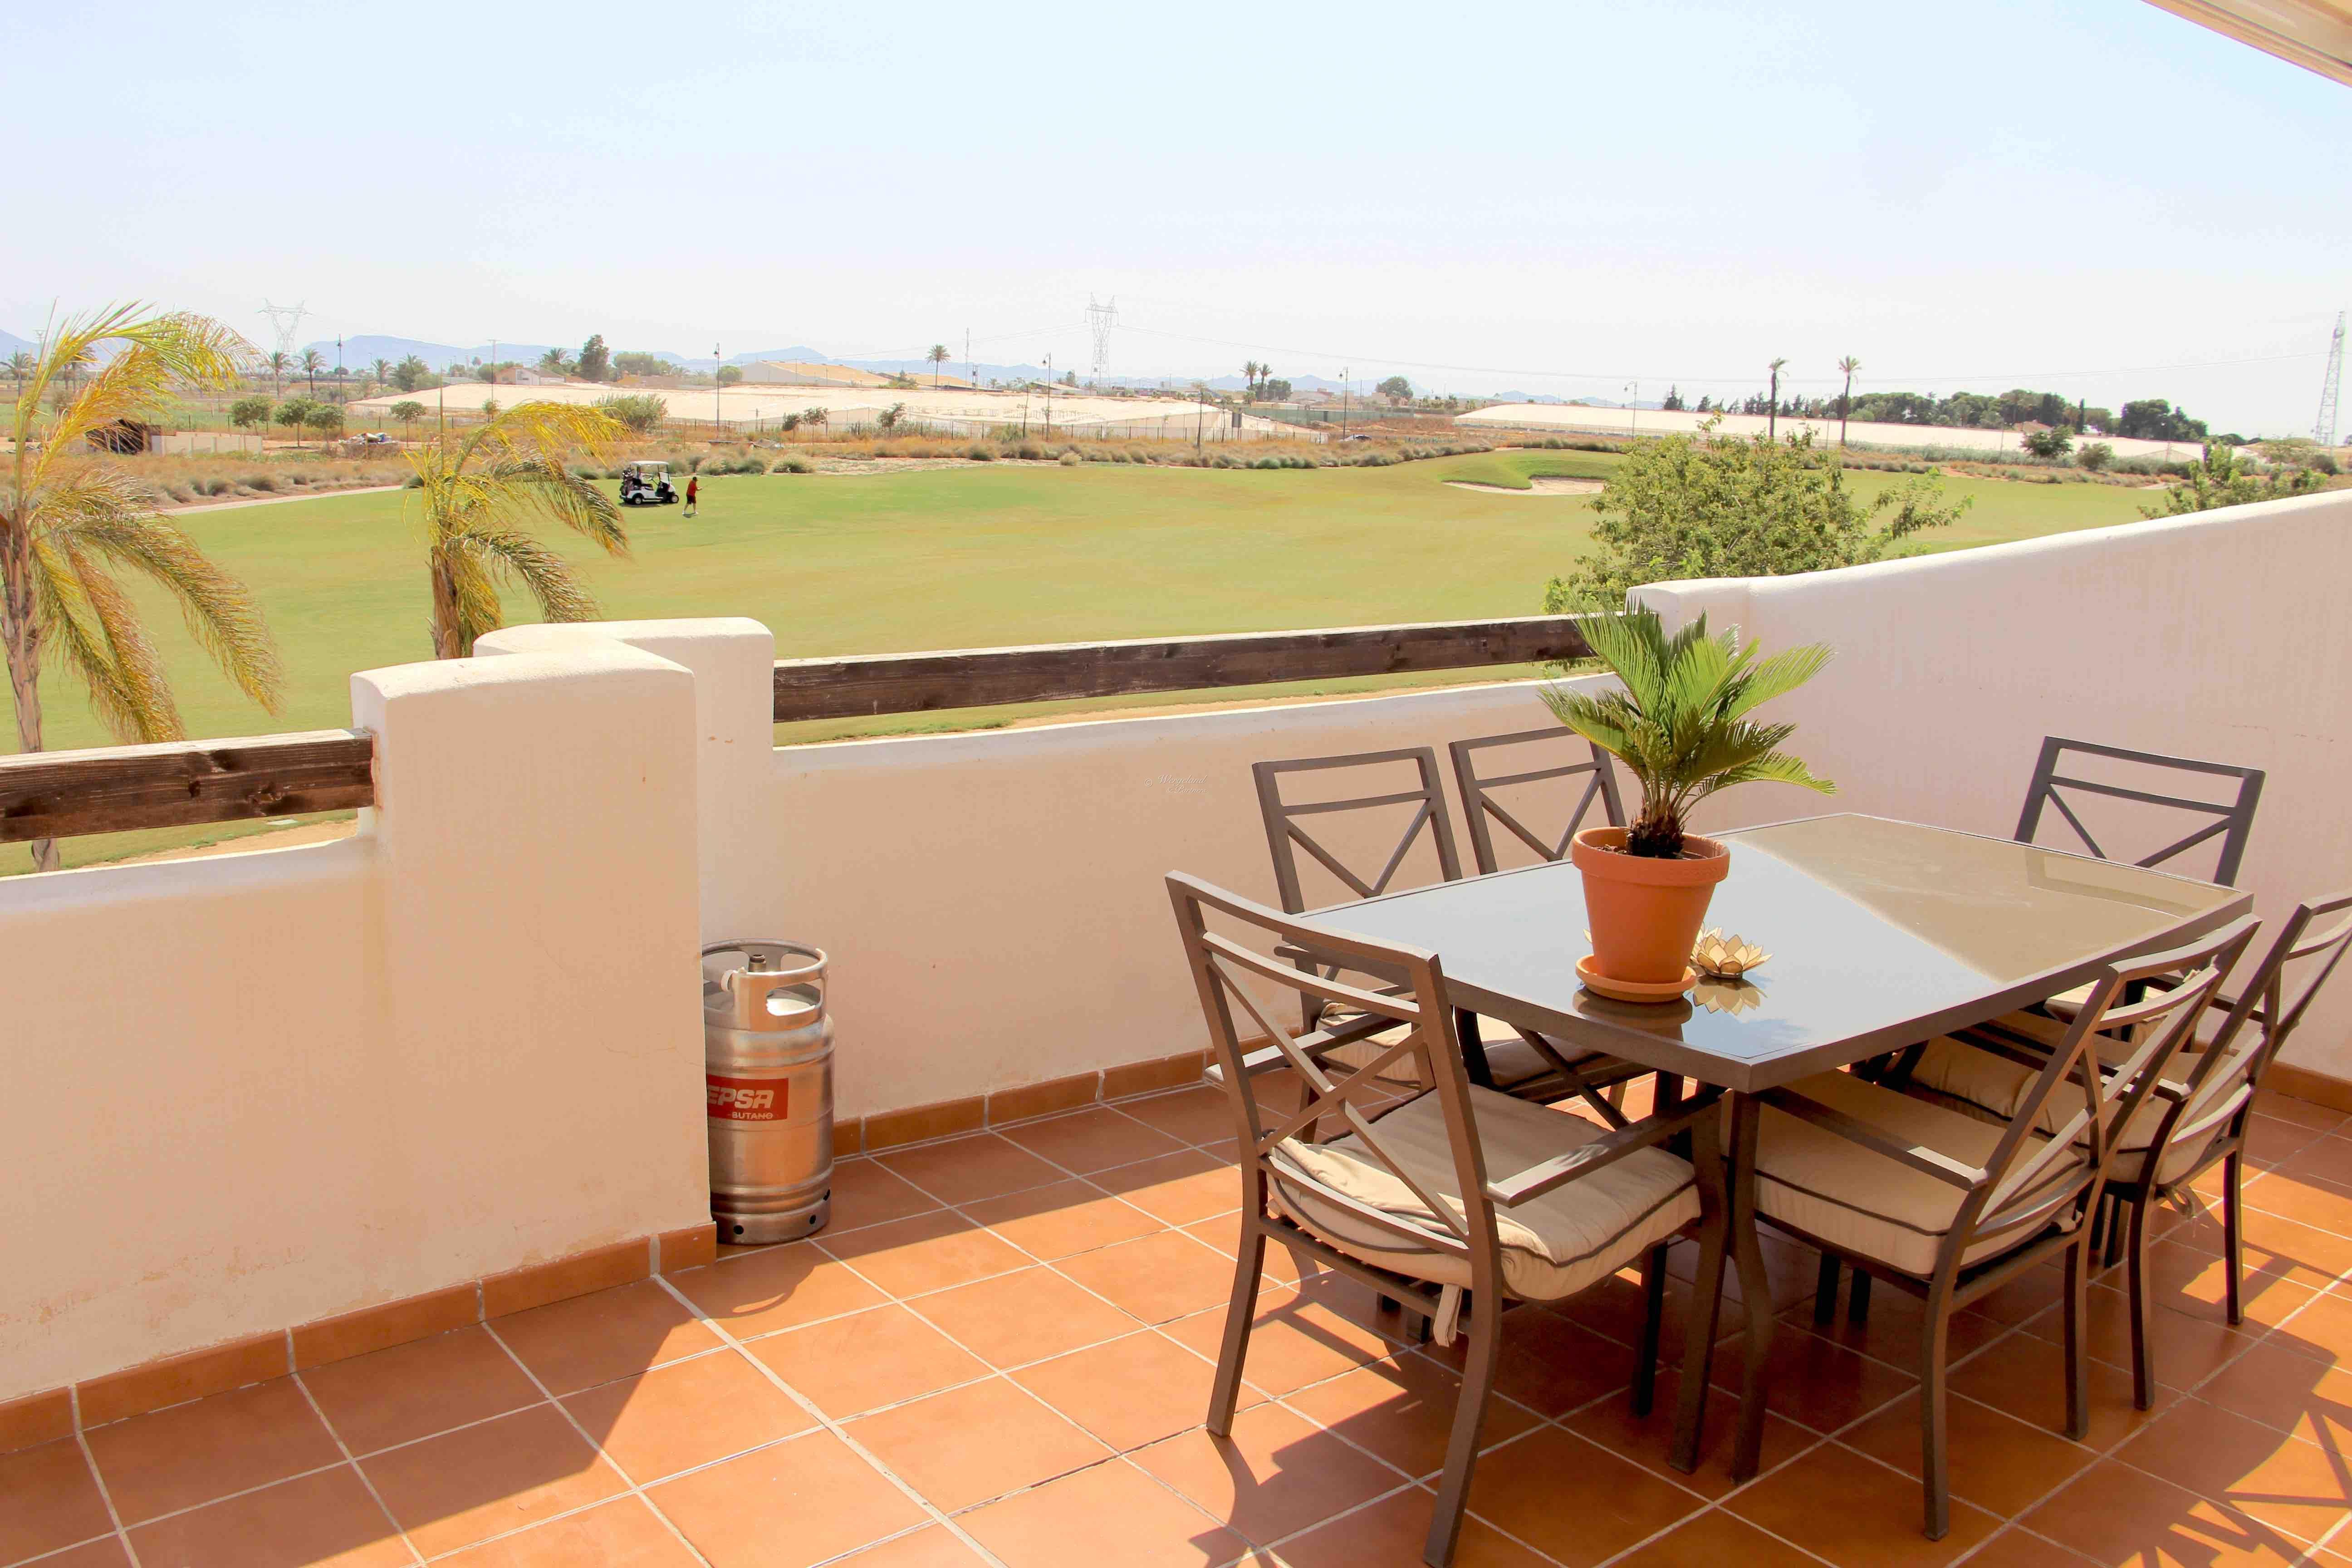 SE PRISEN: 3-roms møblert sydvendt 1.line lys golfleilighet med 40 m2 stor terrasse som bader i sol [A811]